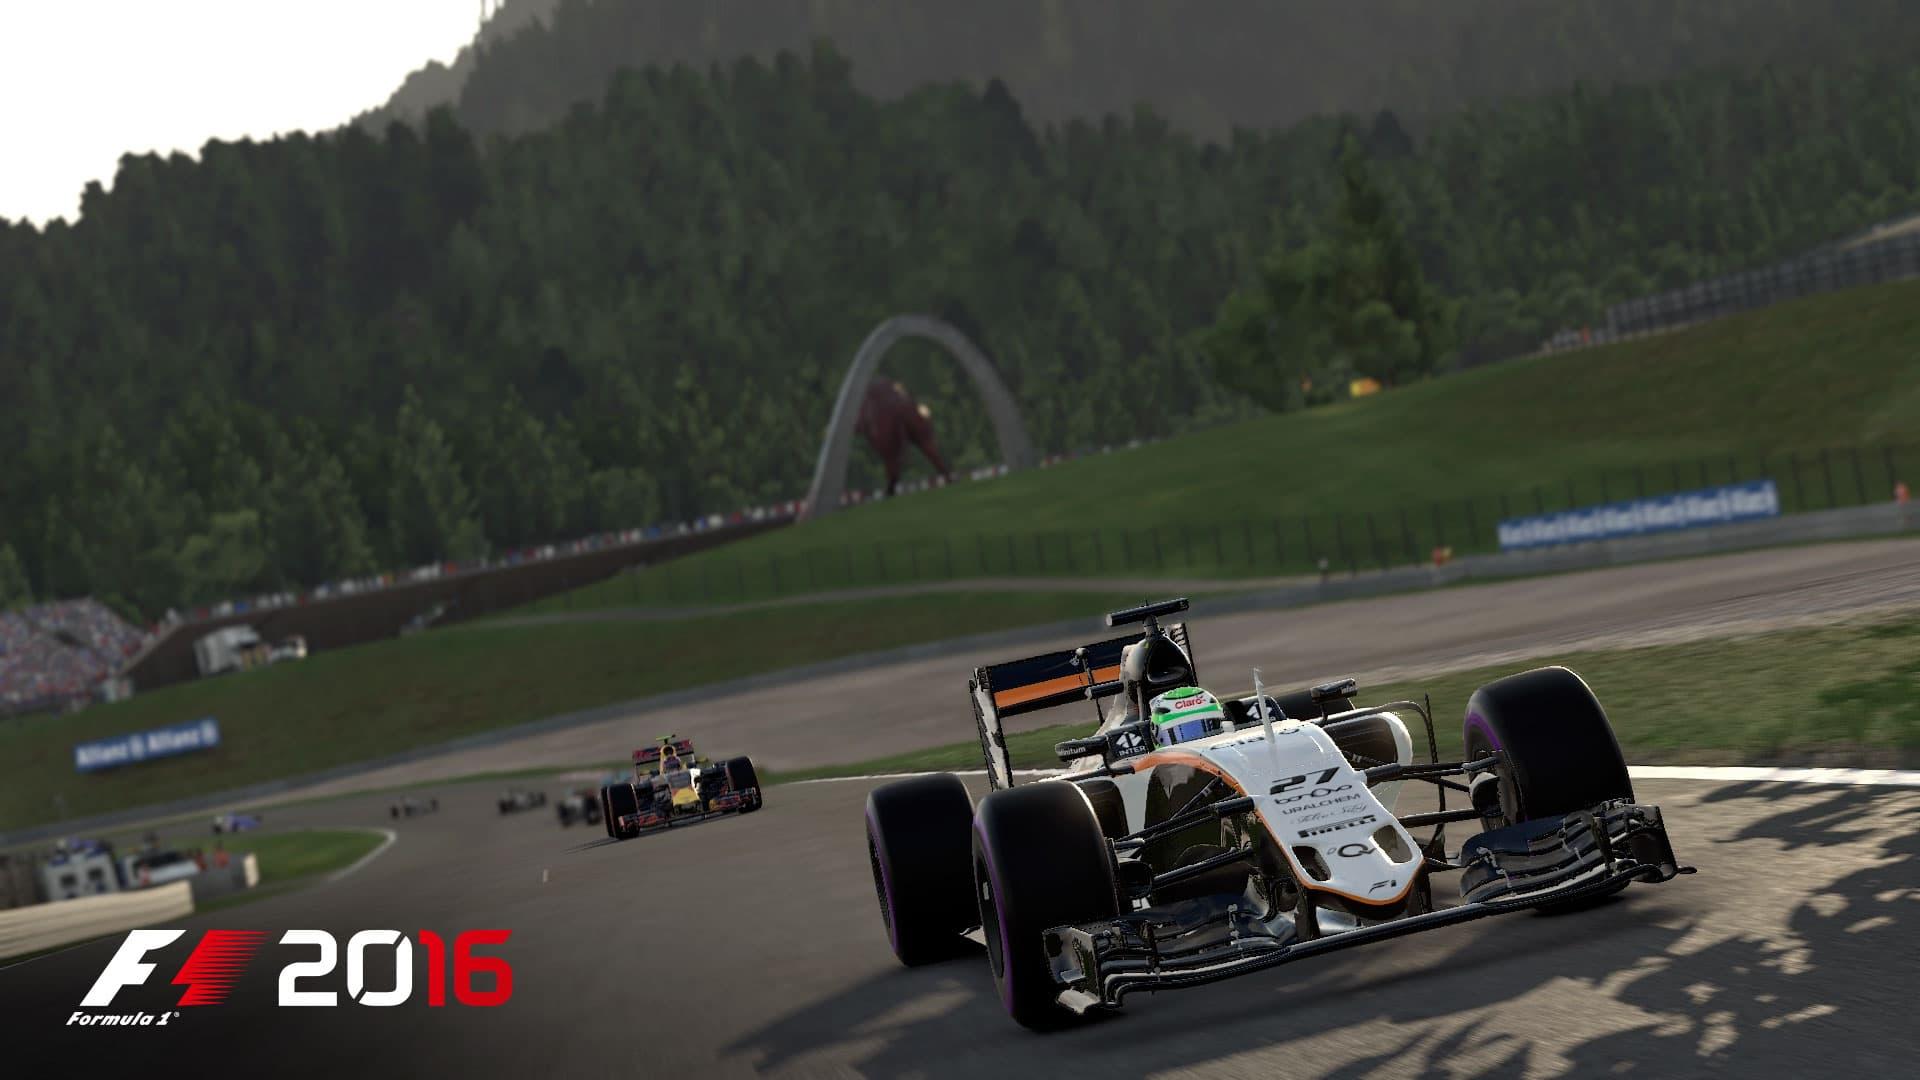 F1 2016 Xbox One